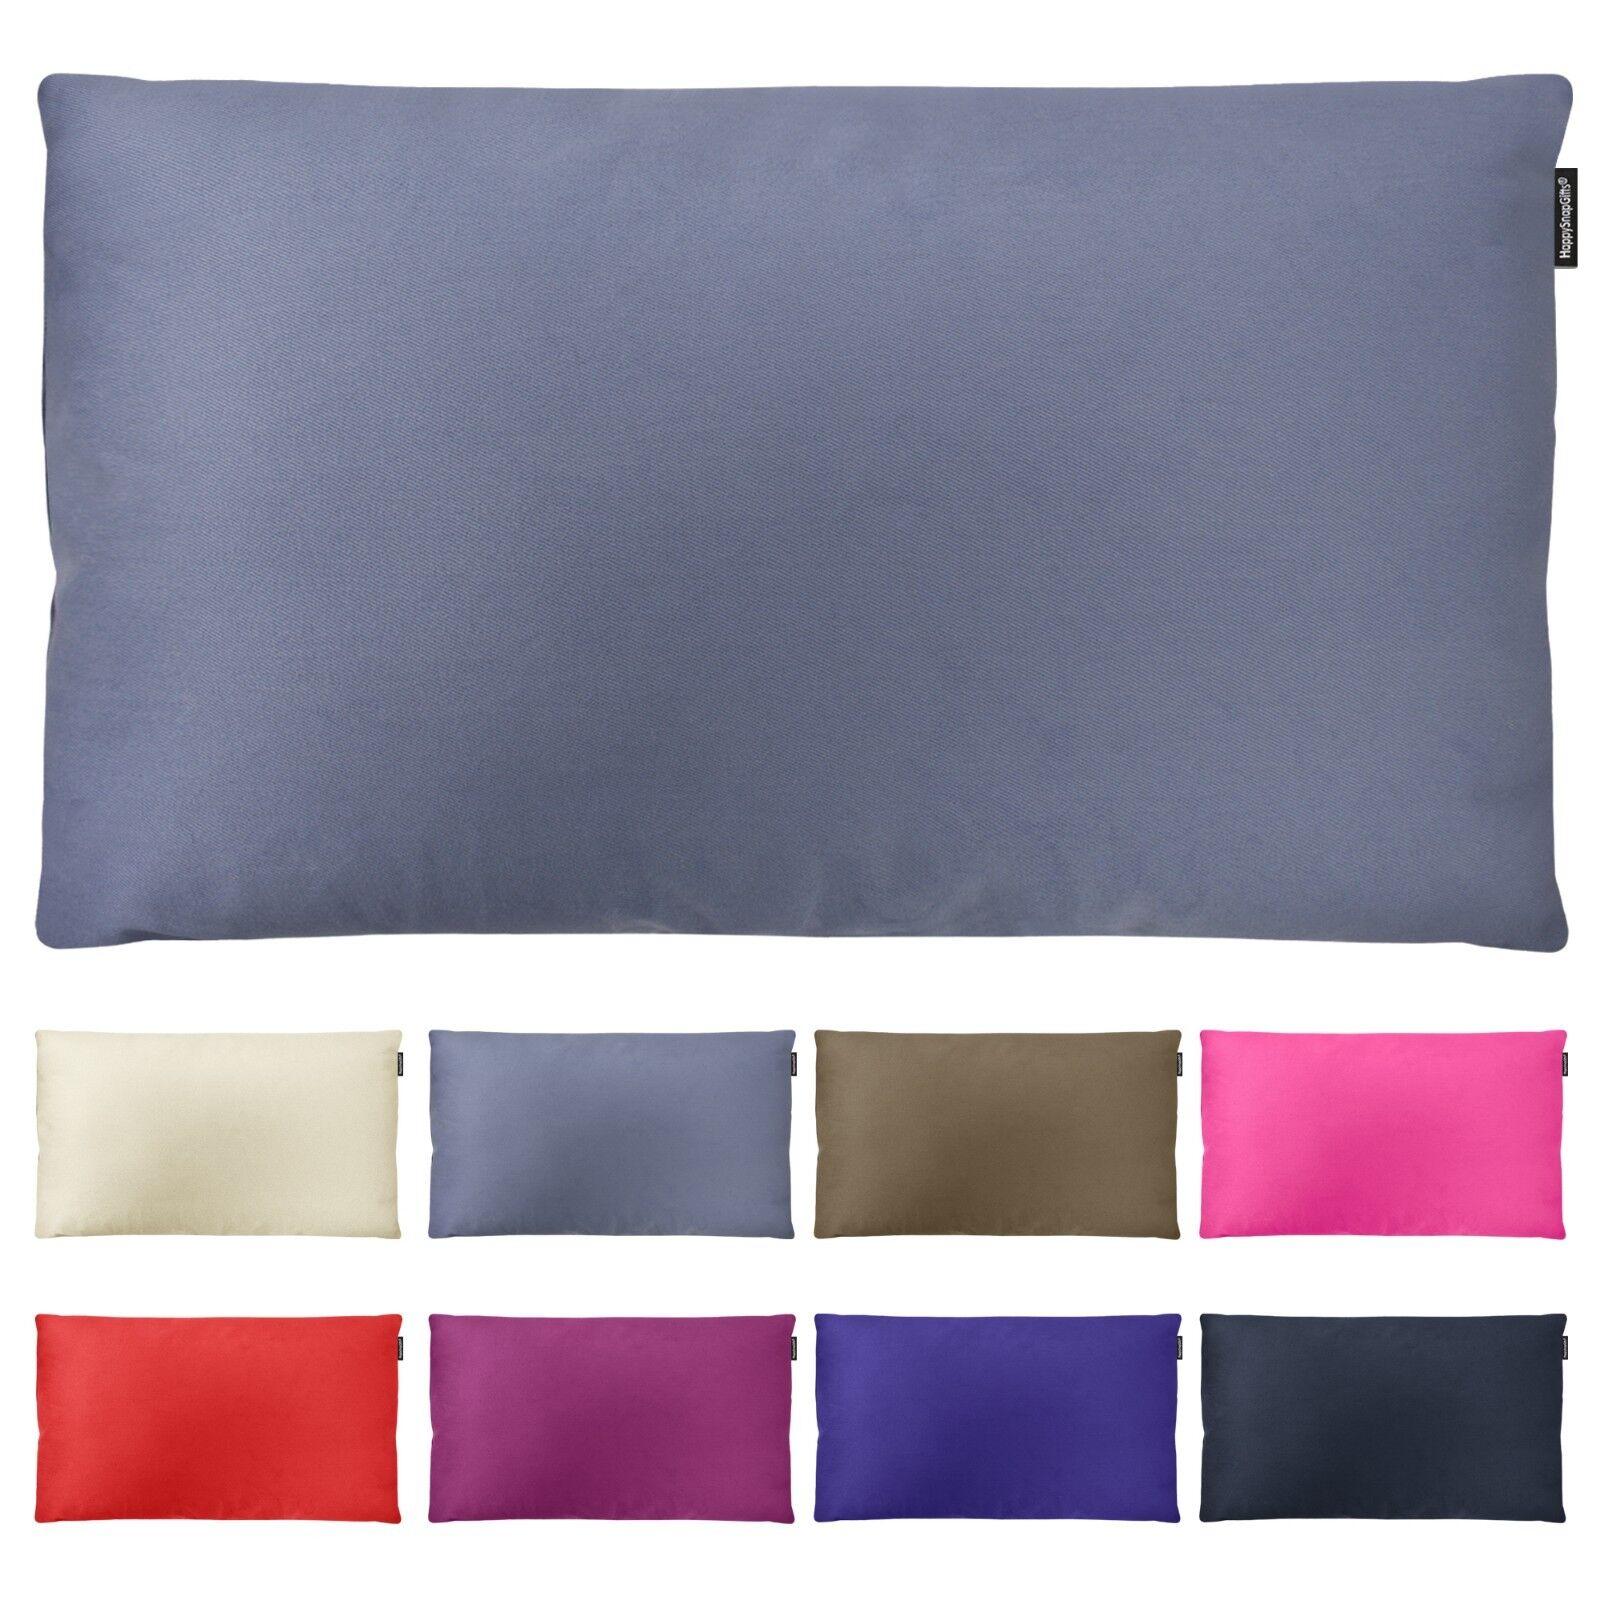 organic sofa uk corner deals buckwheat husk made sleep pillow with zip and adjustable details about filling